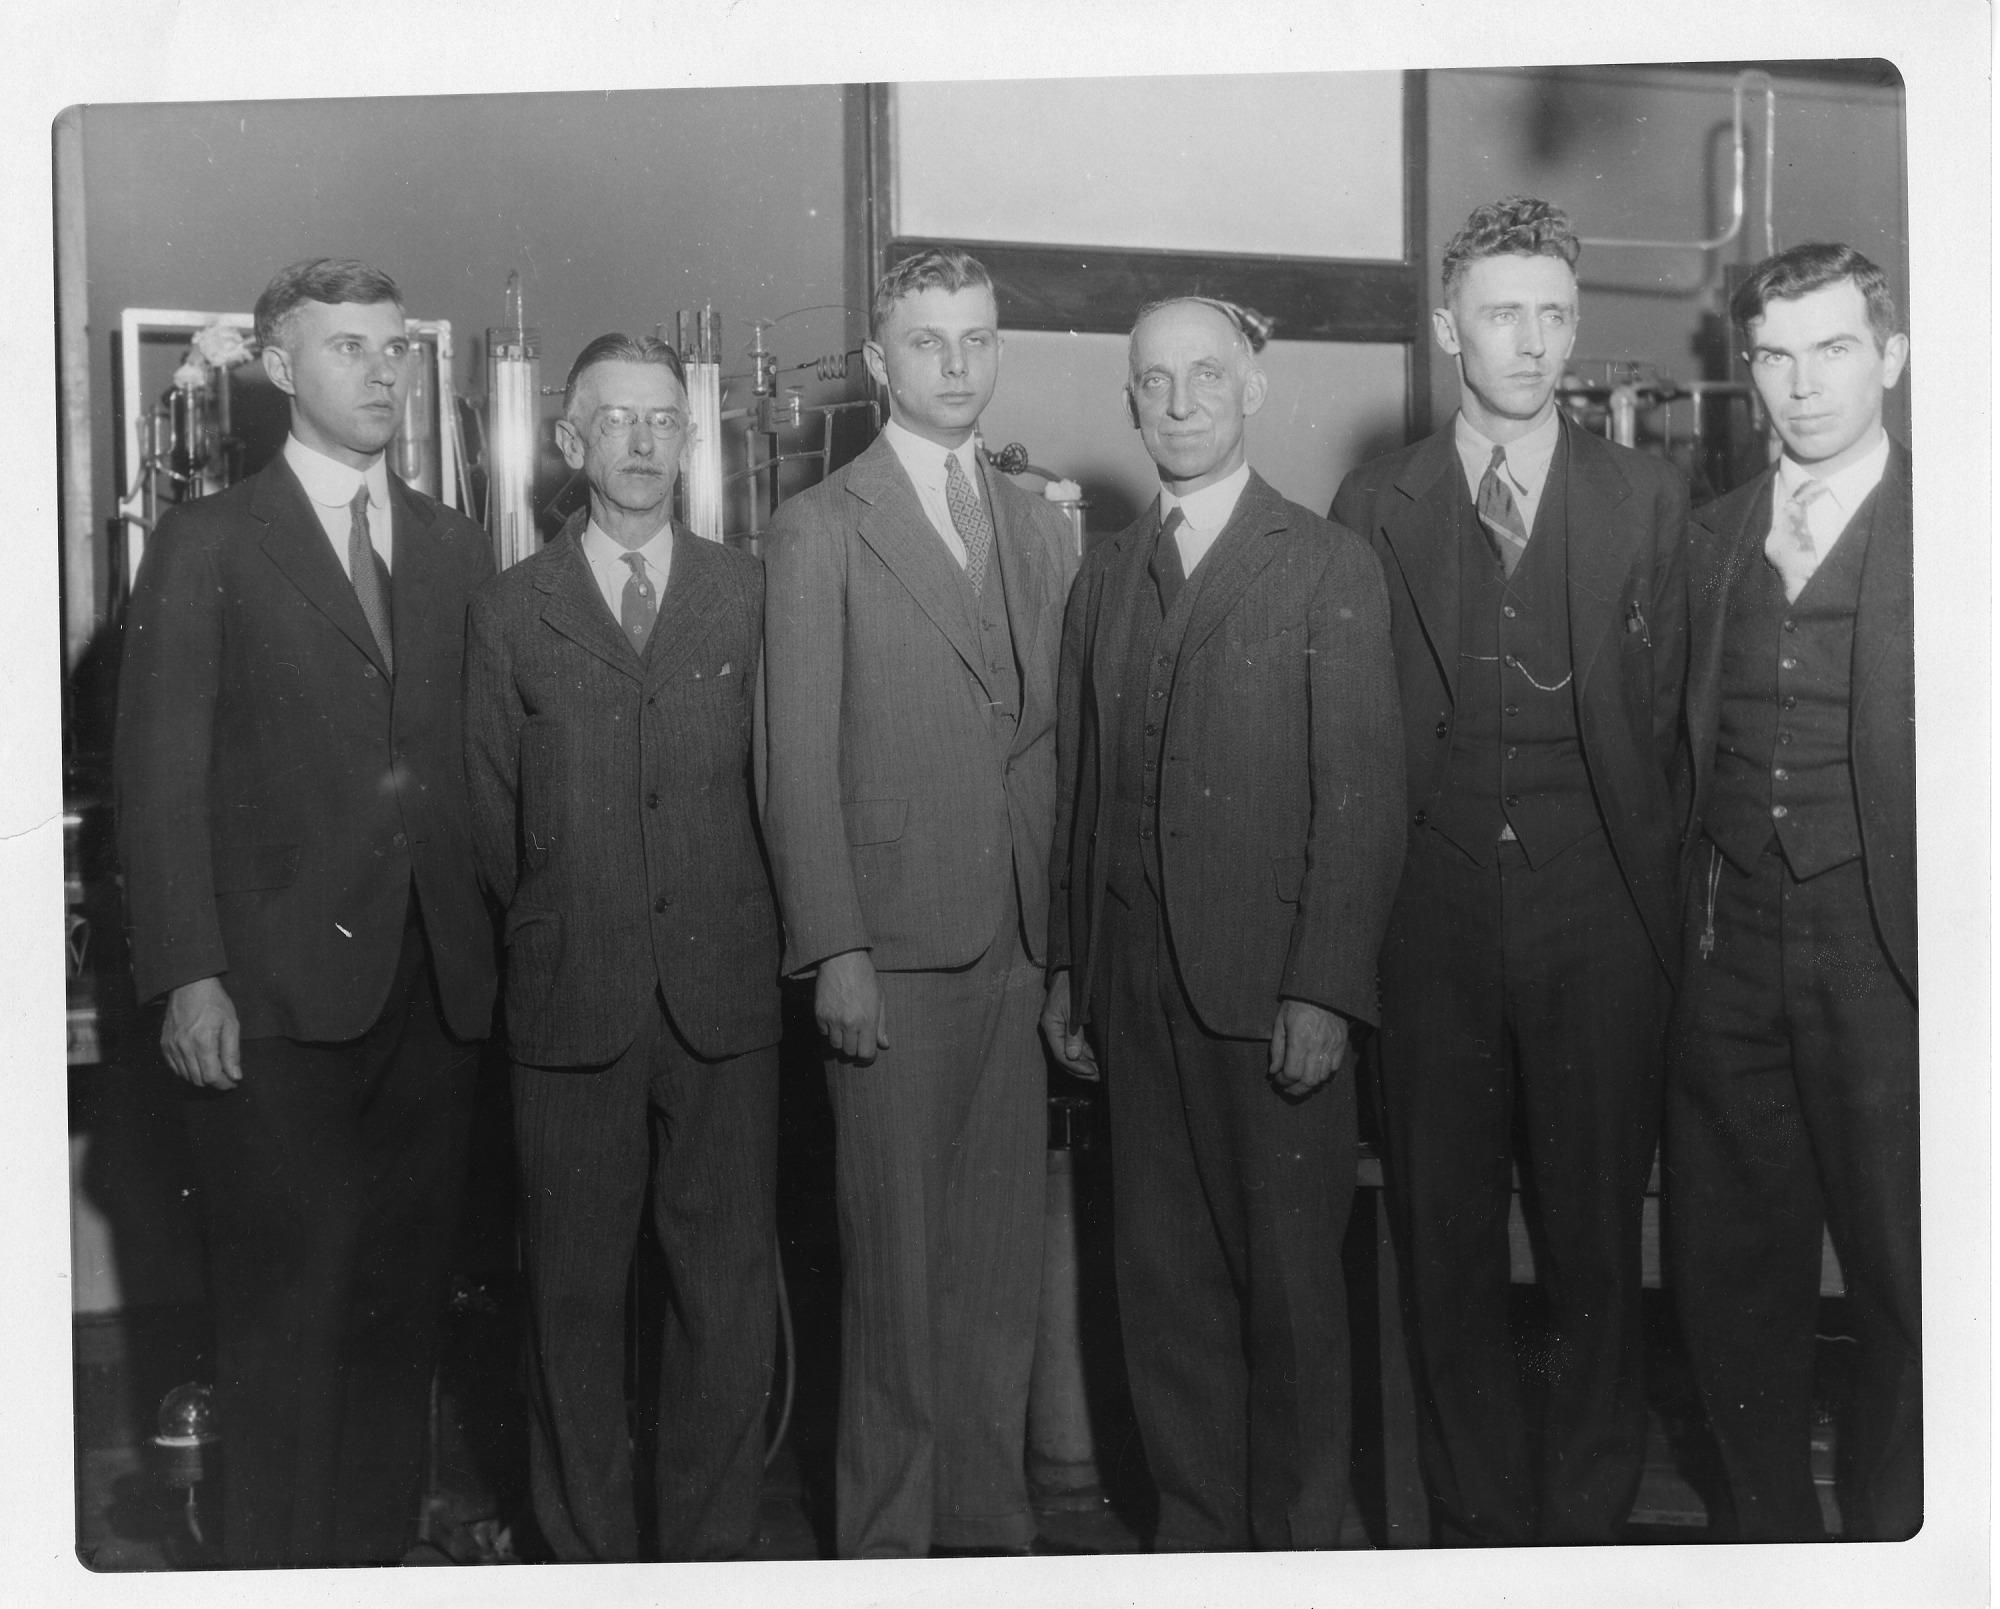 (left to right): W. Cook, J.M. Smoot, Ferdinand Graft Brickwedde (1903-1989), Hobert Cutler Dickinson (1875-1949), C.W. Yost, and Russell Burton Scott (1902-1967)